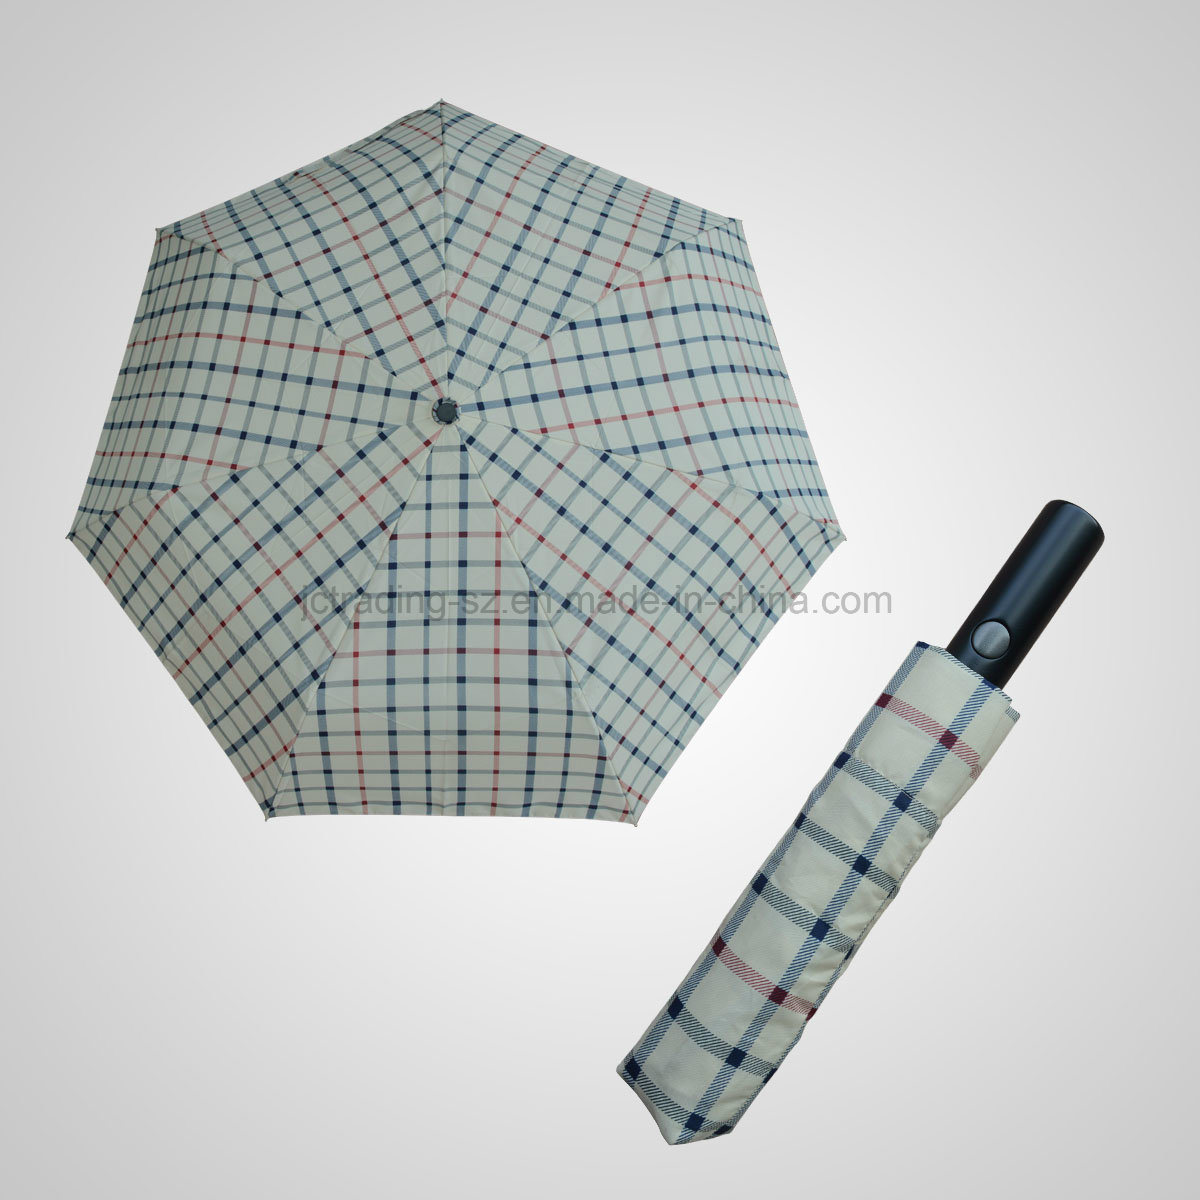 3 Fold Automatic Open&Close Lady Slim Umbrella (JF-AOC303)